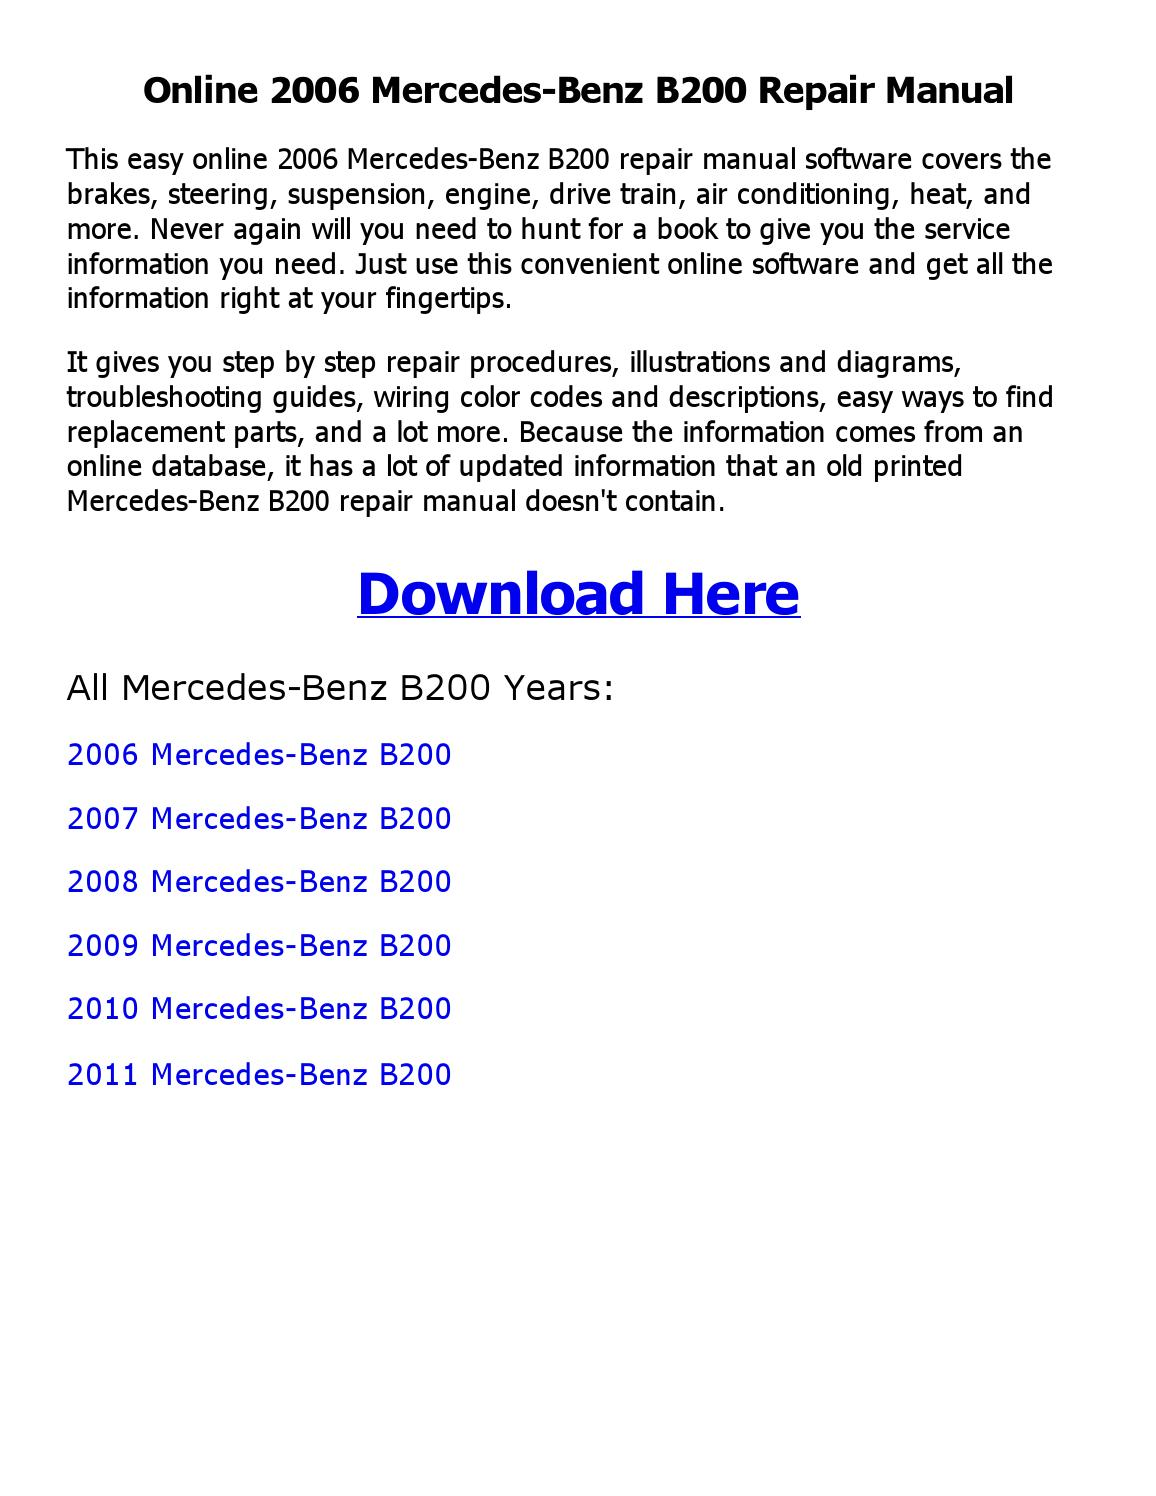 2006 Mercedes Benz B200 Repair Manual Online By Orm82901